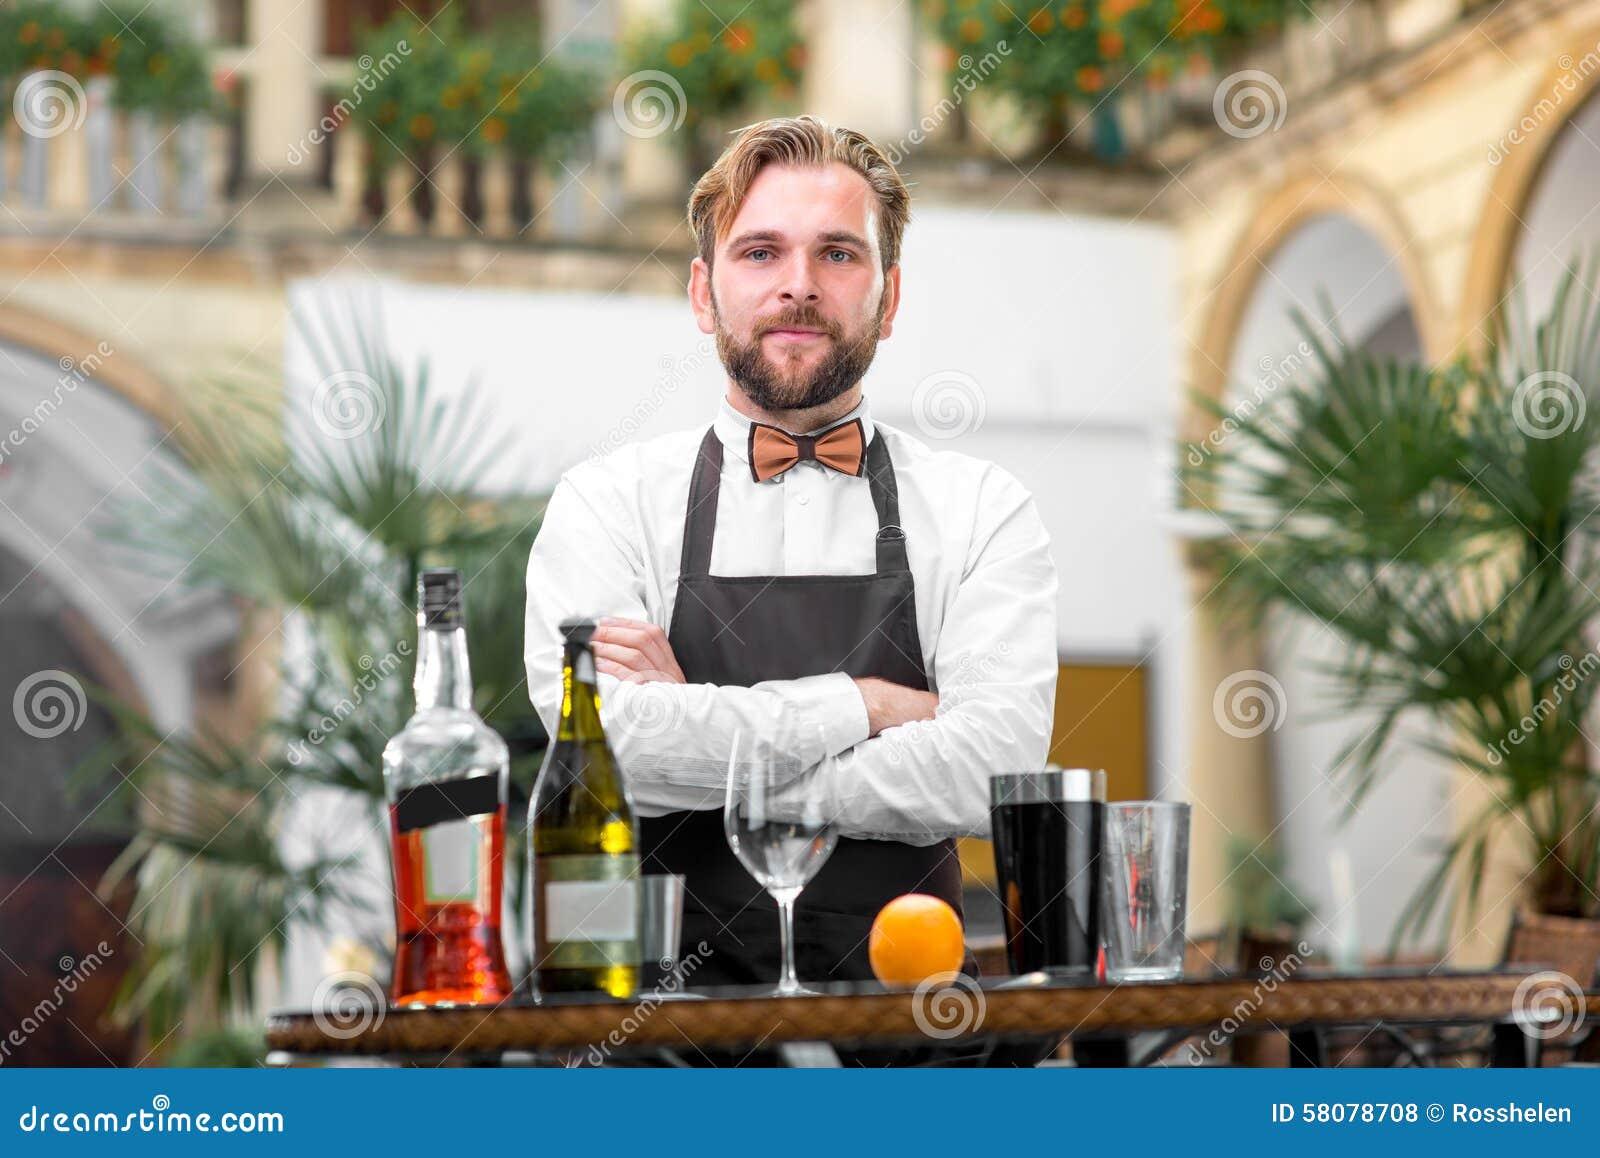 Portrait Of Barman At The Restaurant Stock Photo Image